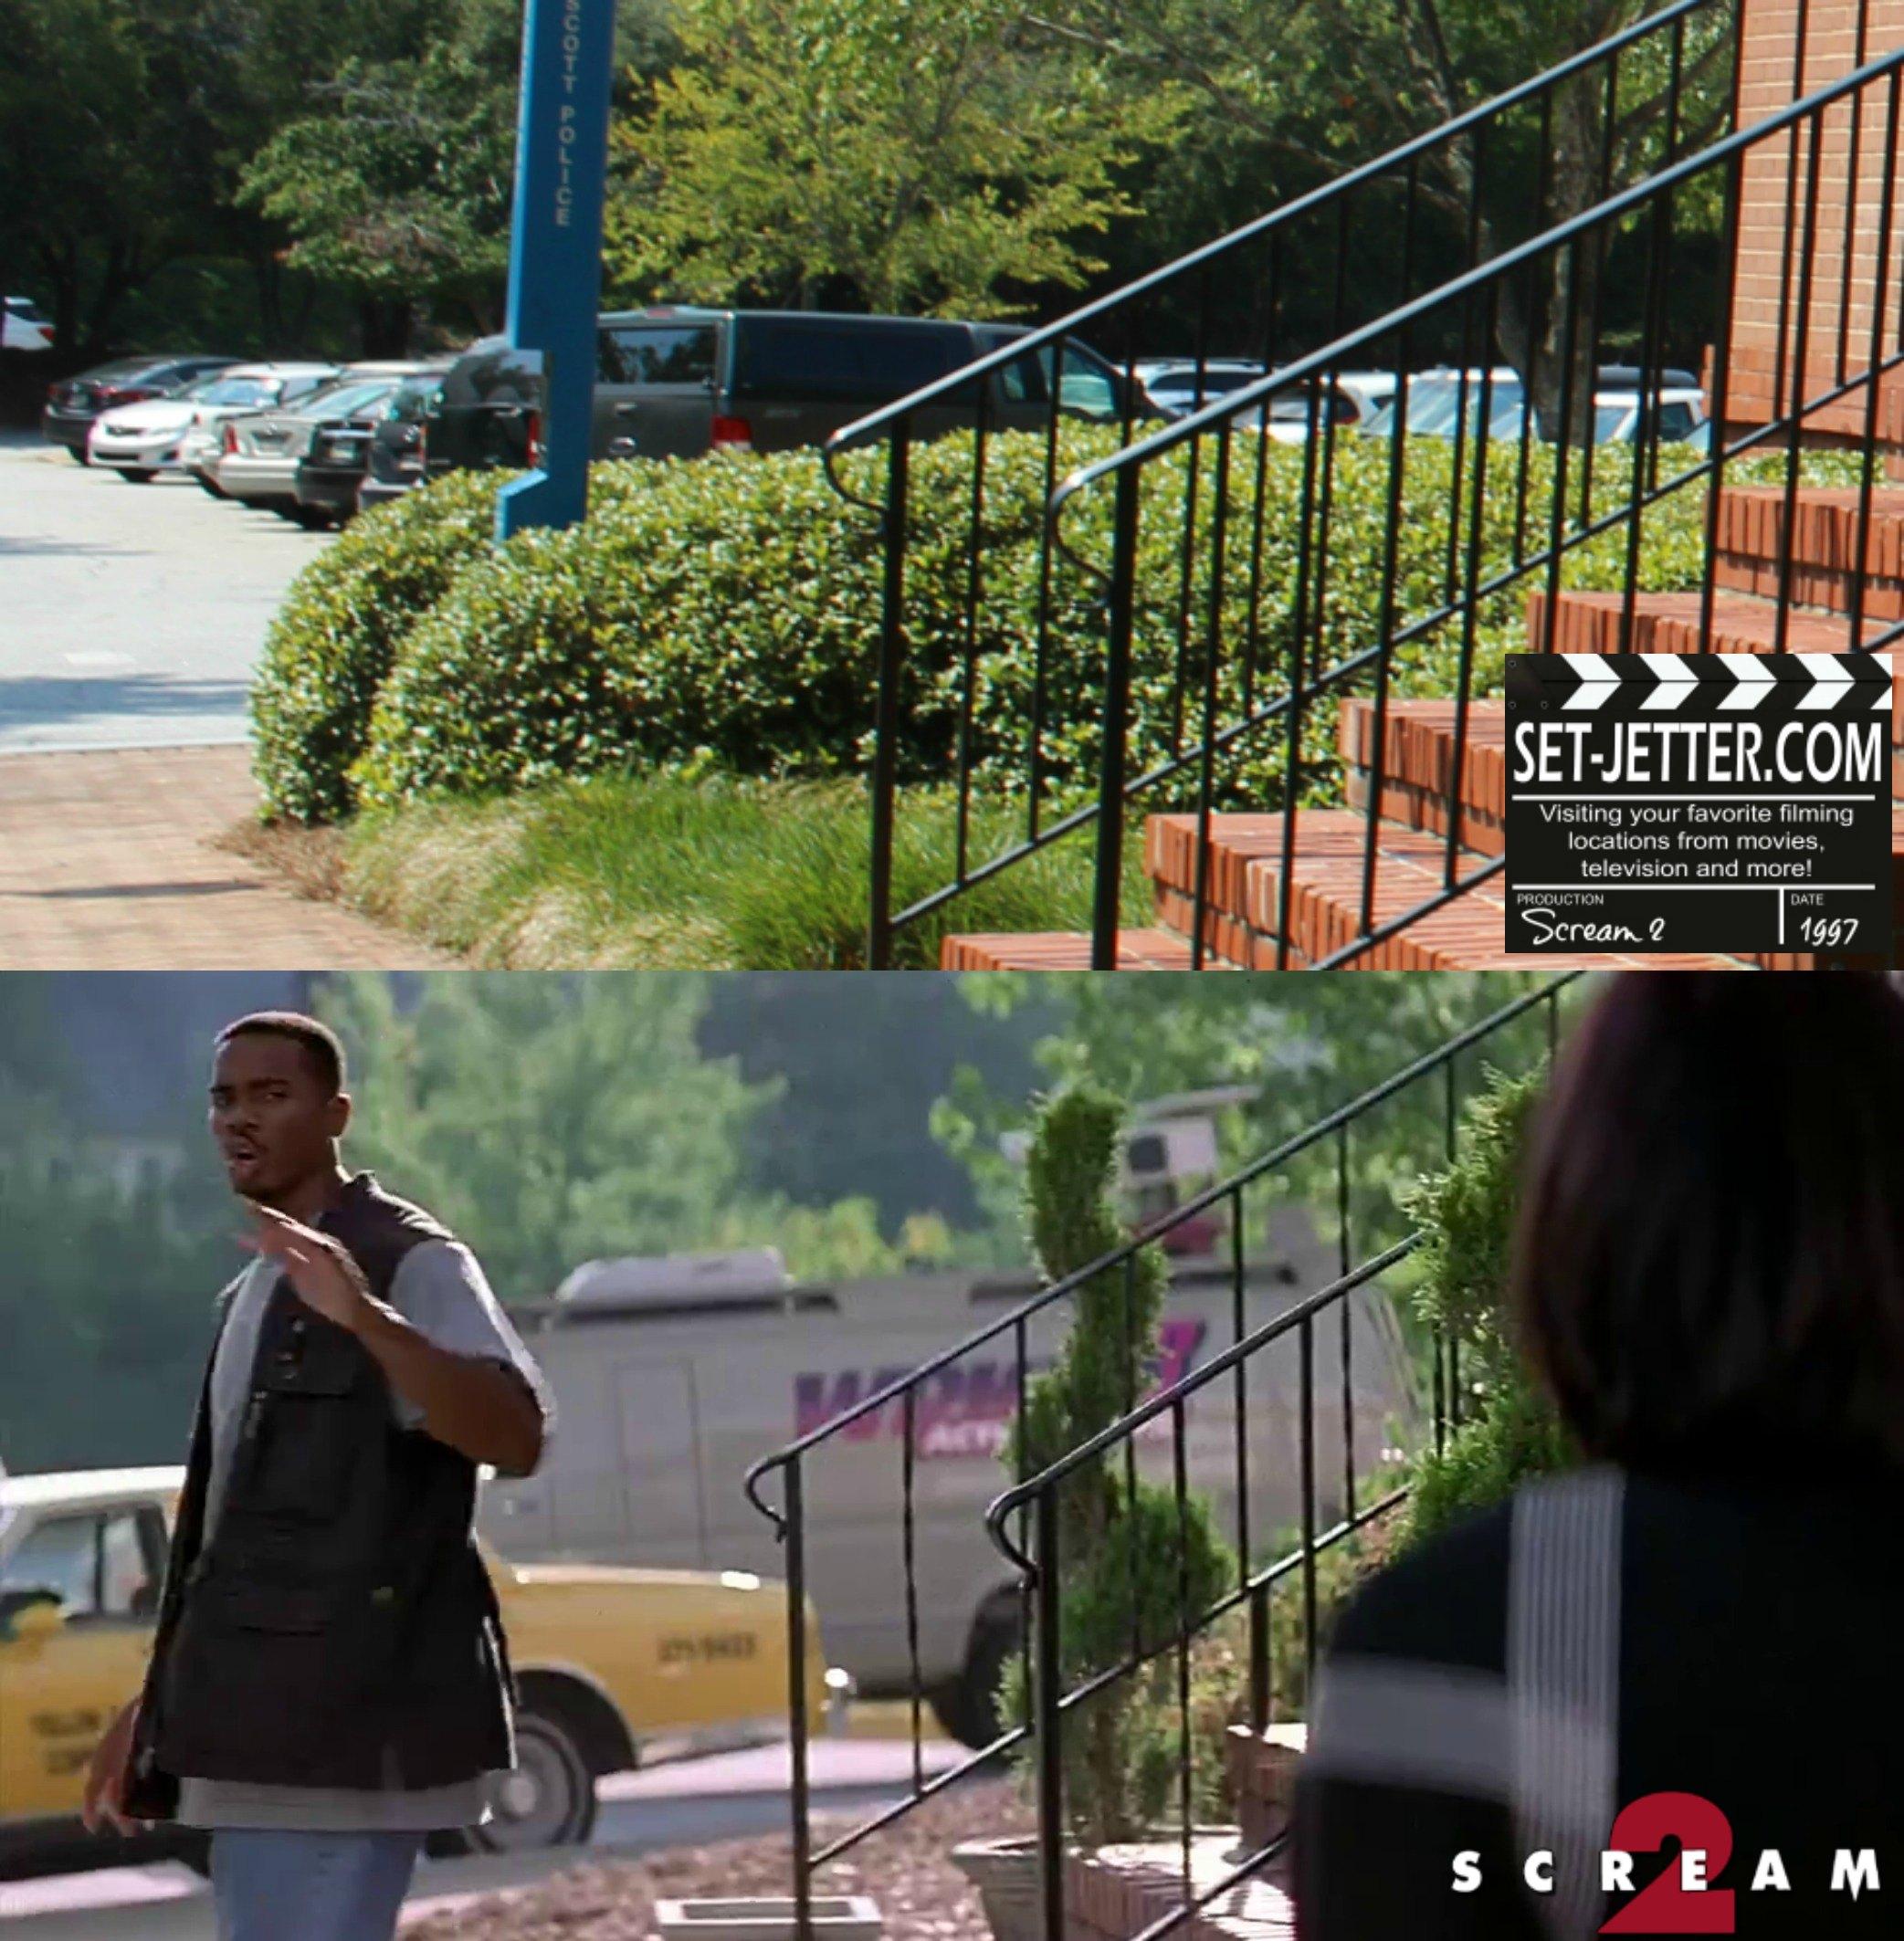 Scream 2 comparison 213.jpg